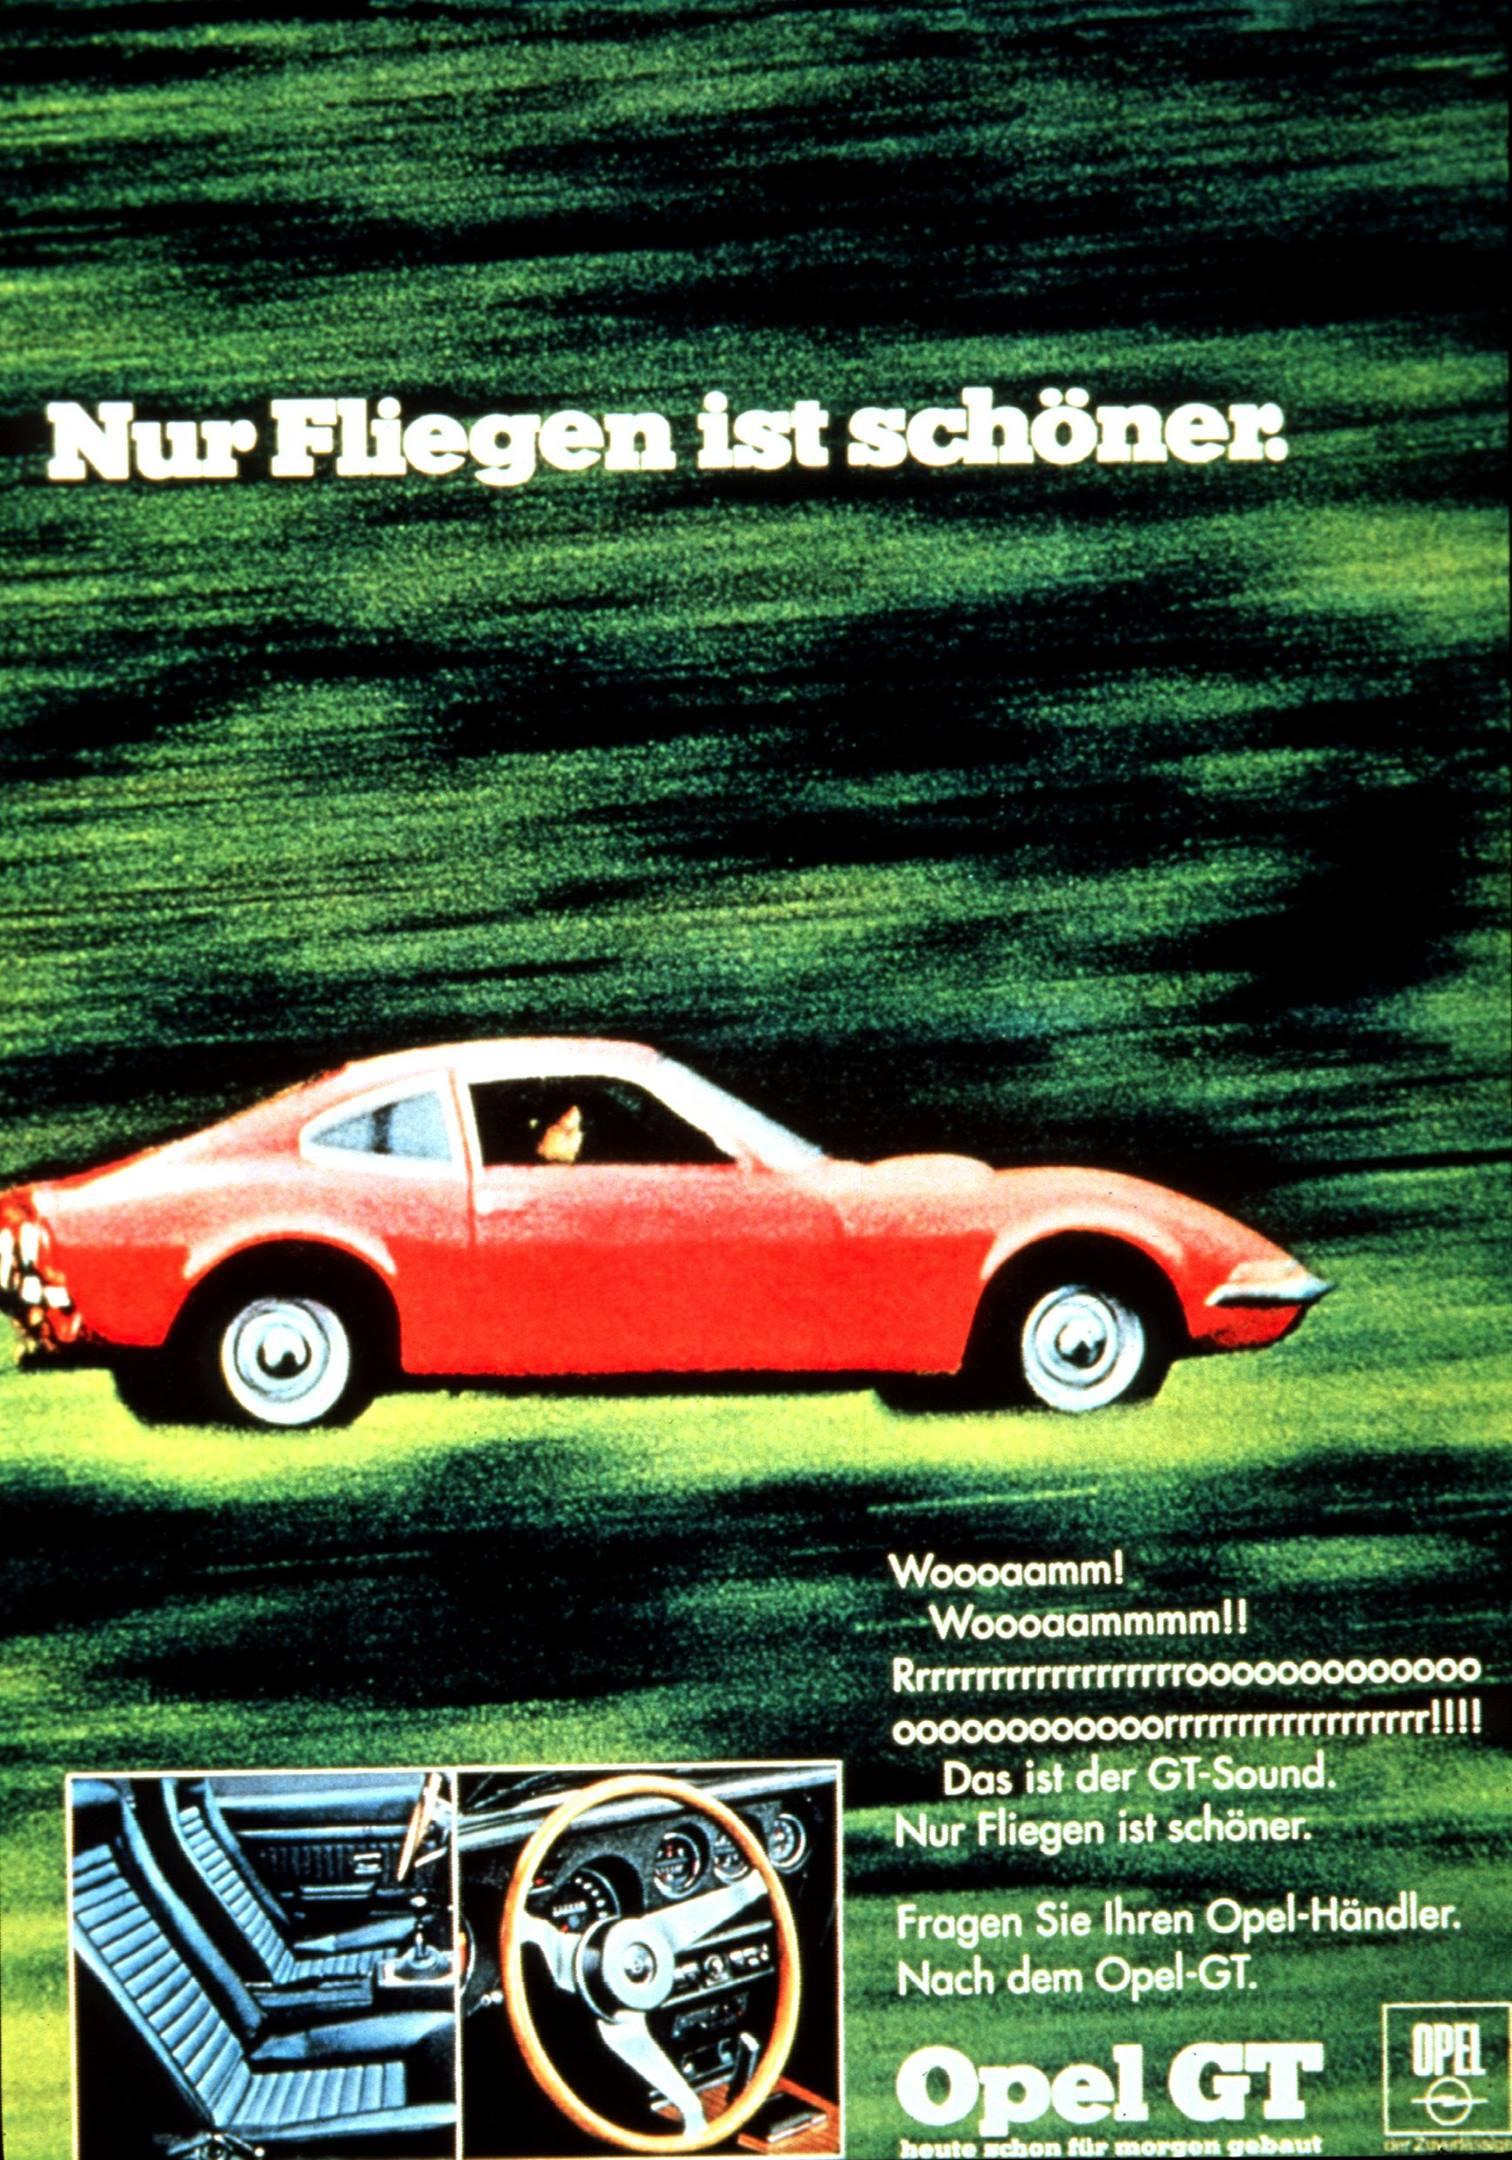 1968 Opel GT advertisement